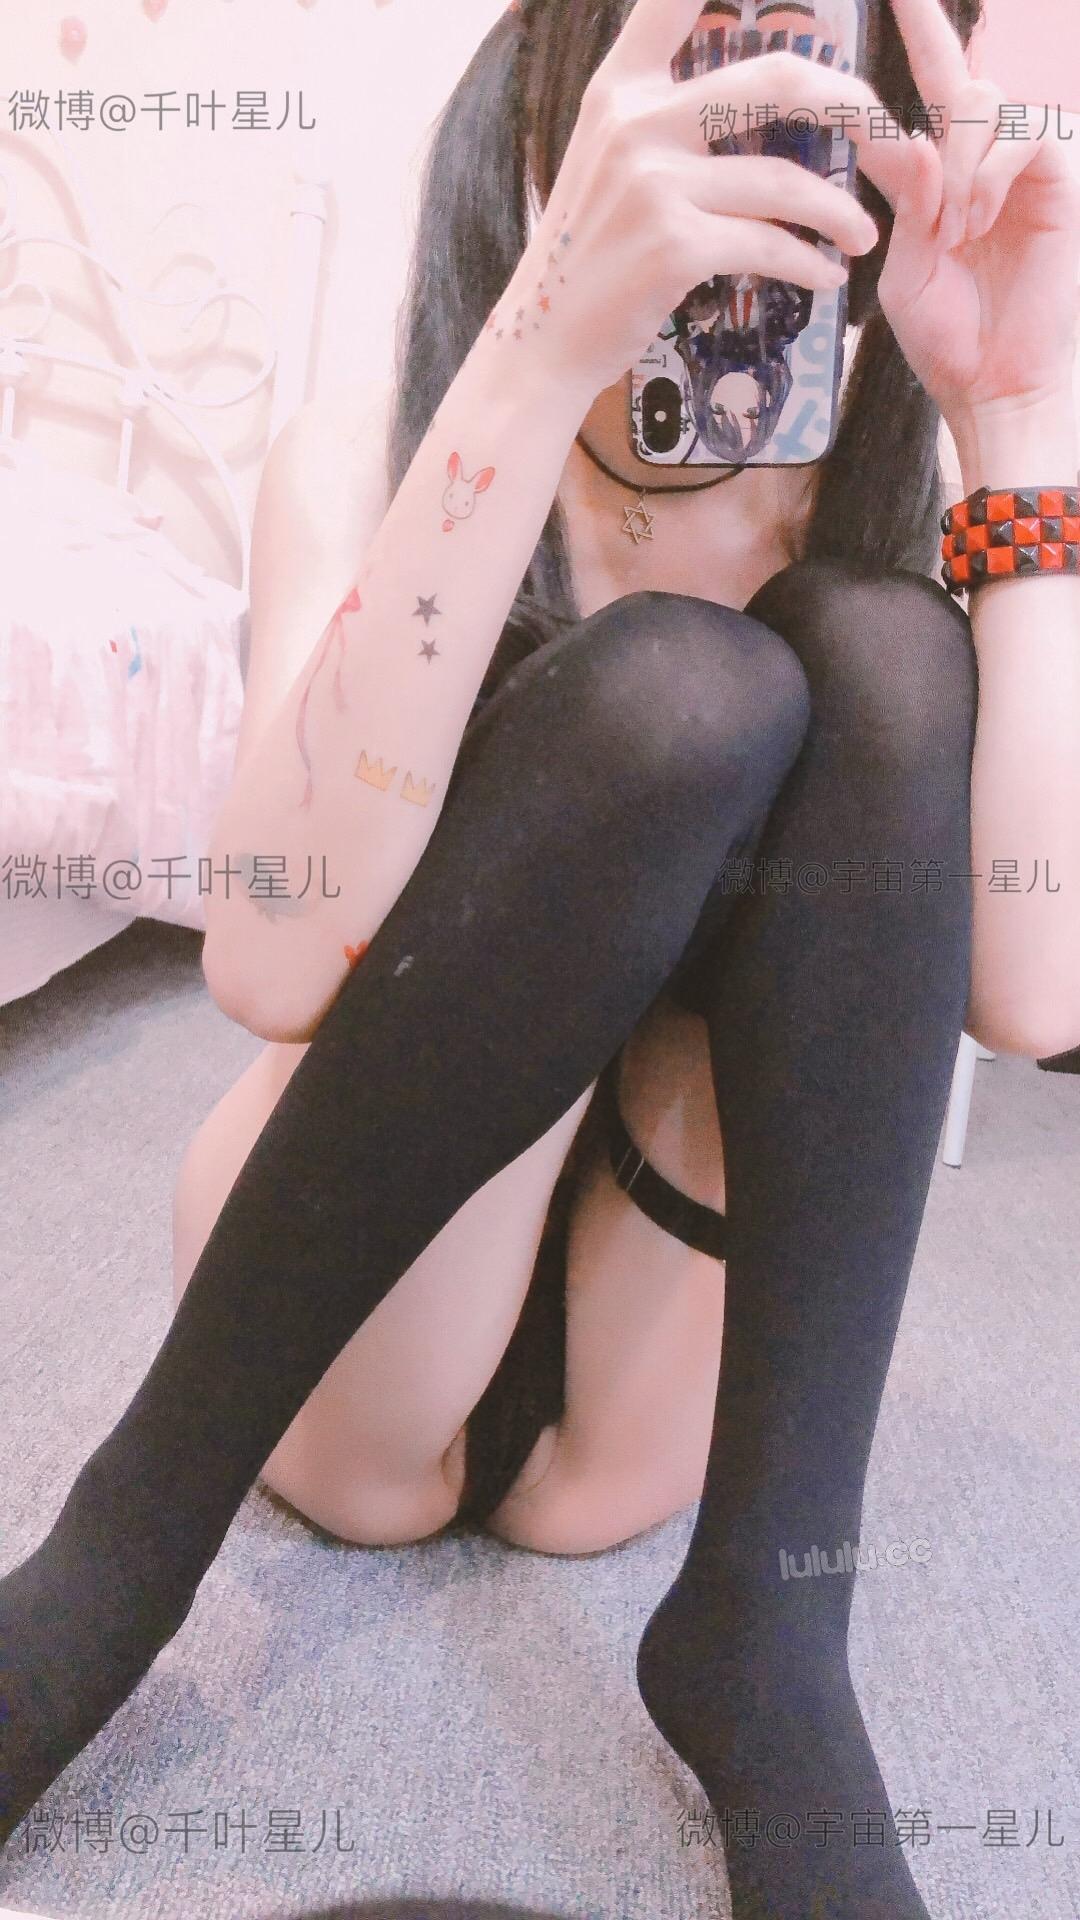 983 - Cute sweet girl 千叶星儿 005 Preview version